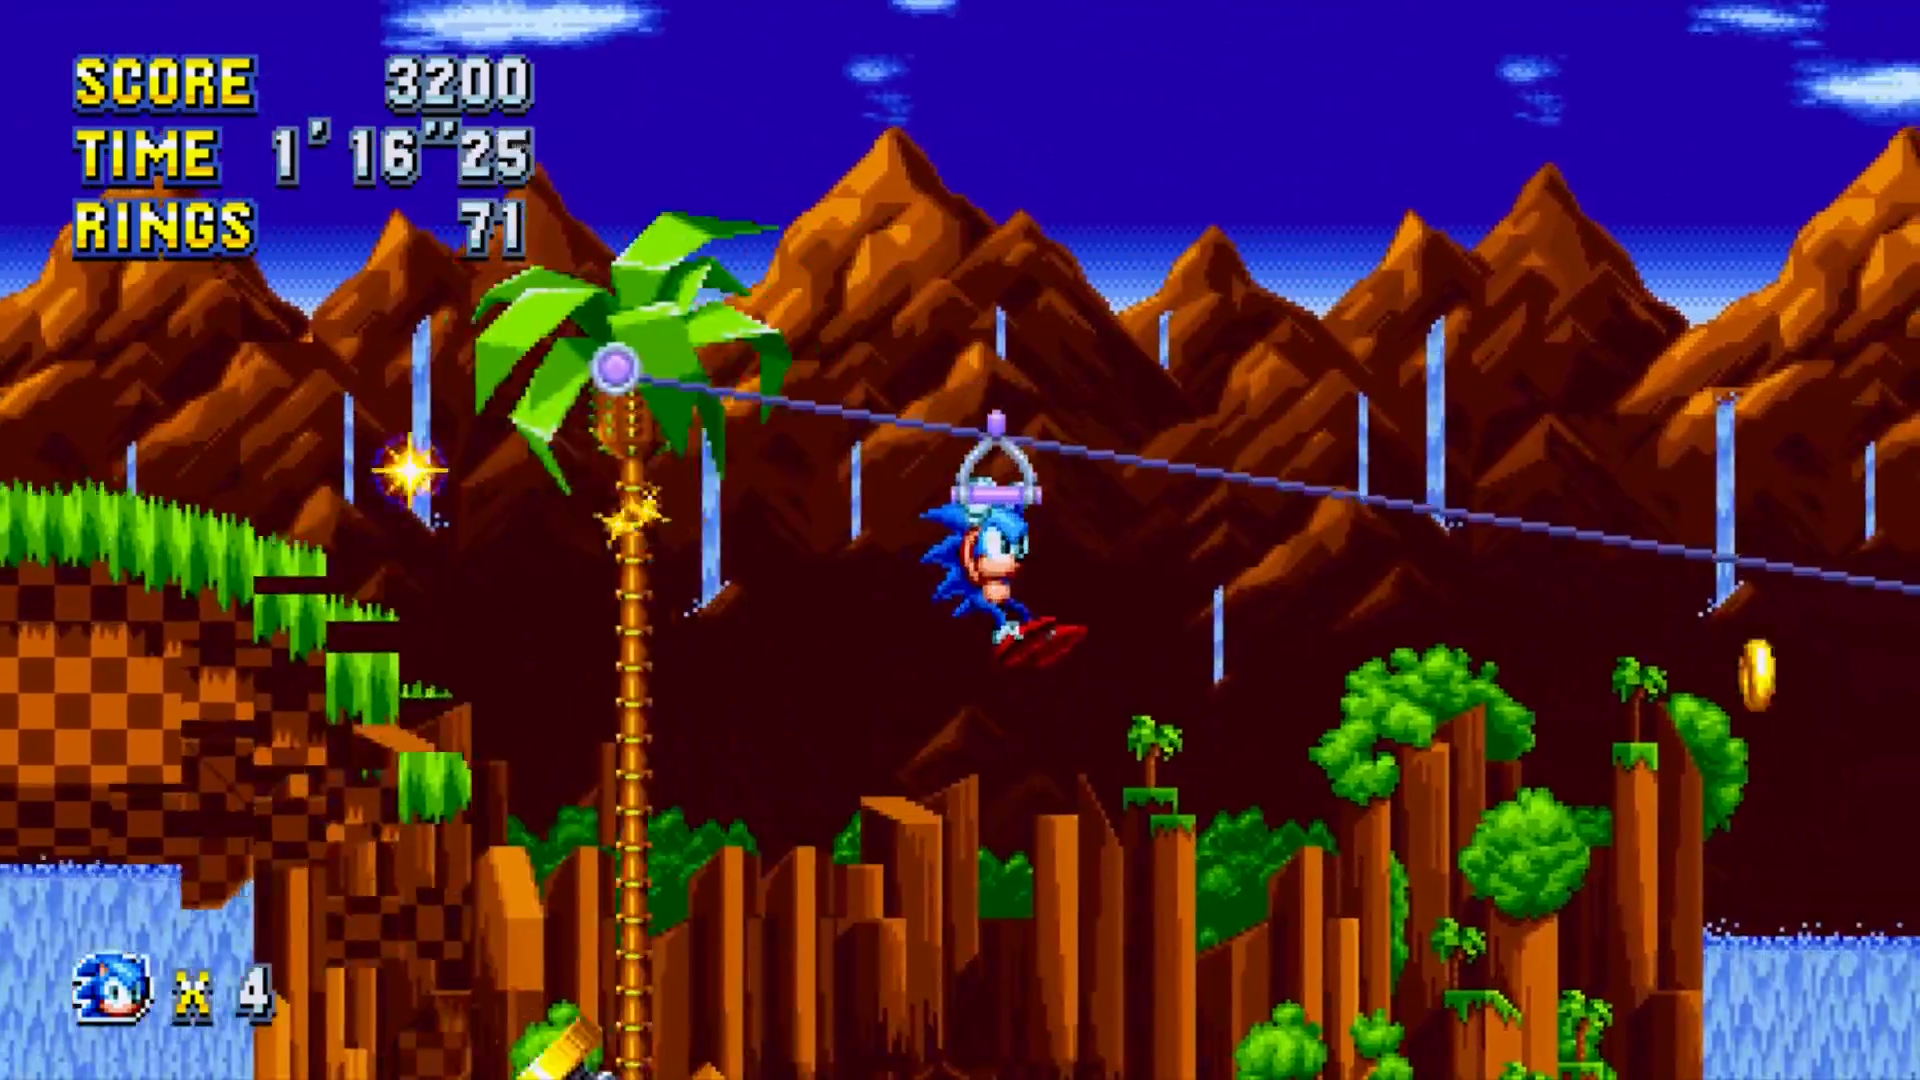 Green Hill Zone Sonic Mania Sonic News Network Fandom